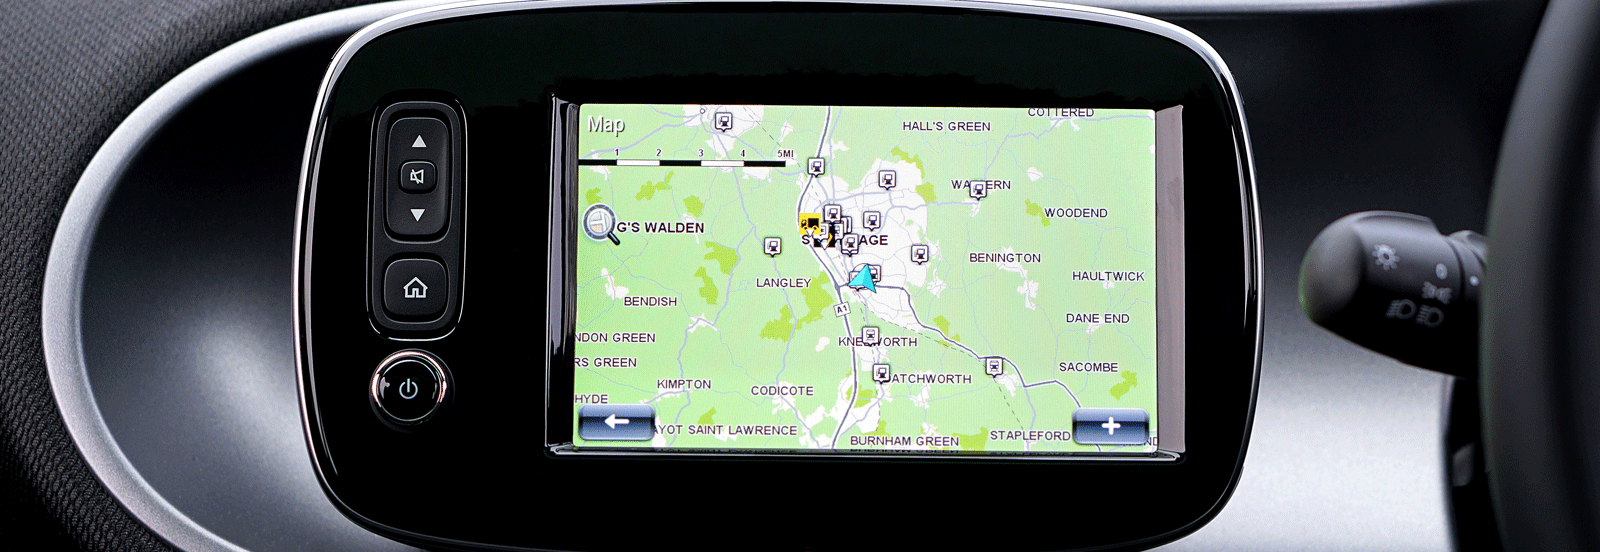 SatNavs and navigation